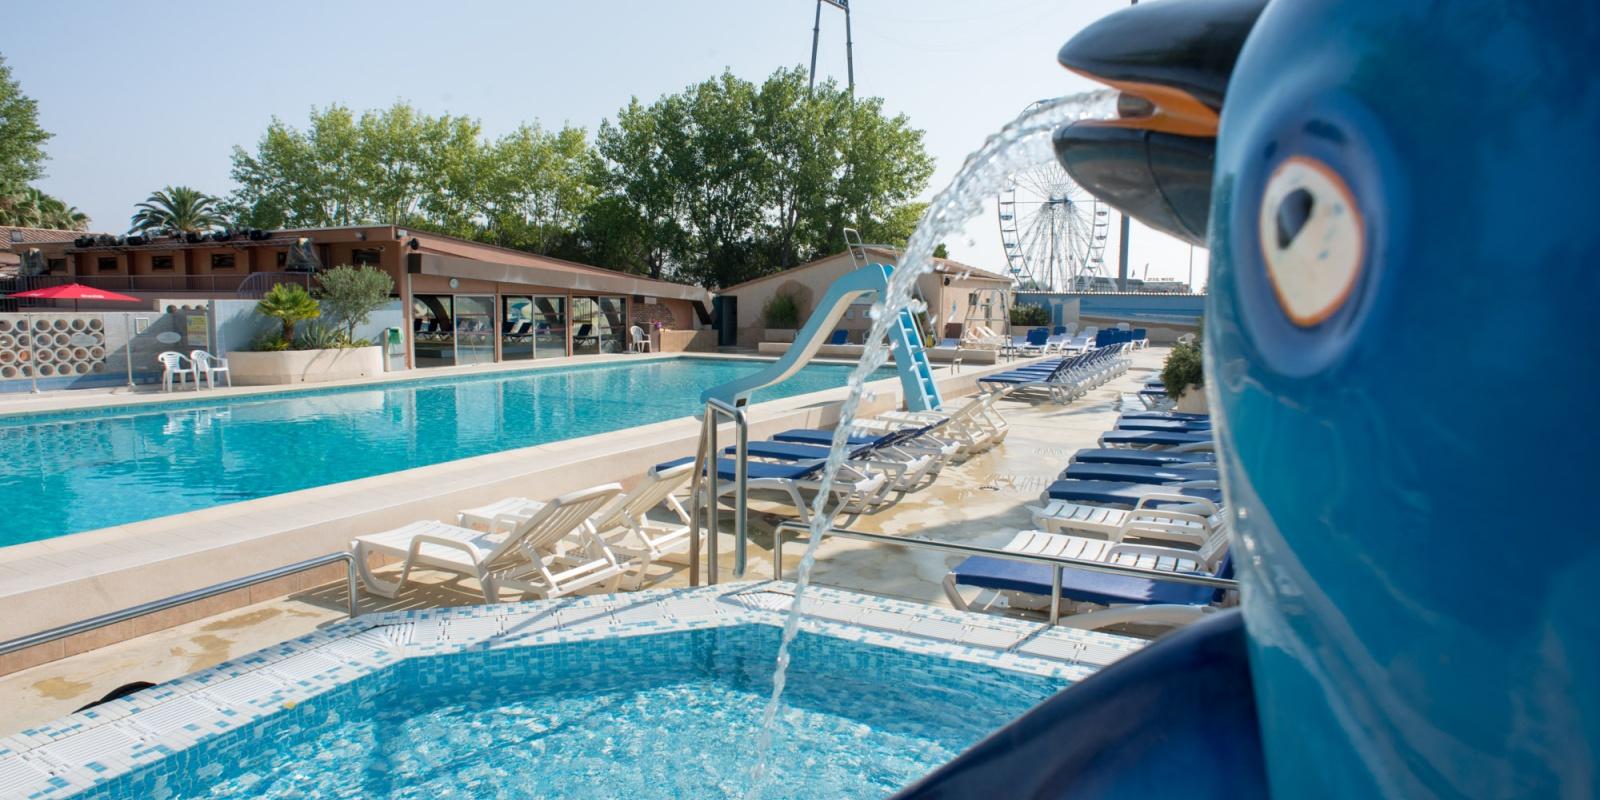 Piscine d 39 t piscine couverte camping au grau du roi for Camping grau du roi bord de mer avec piscine